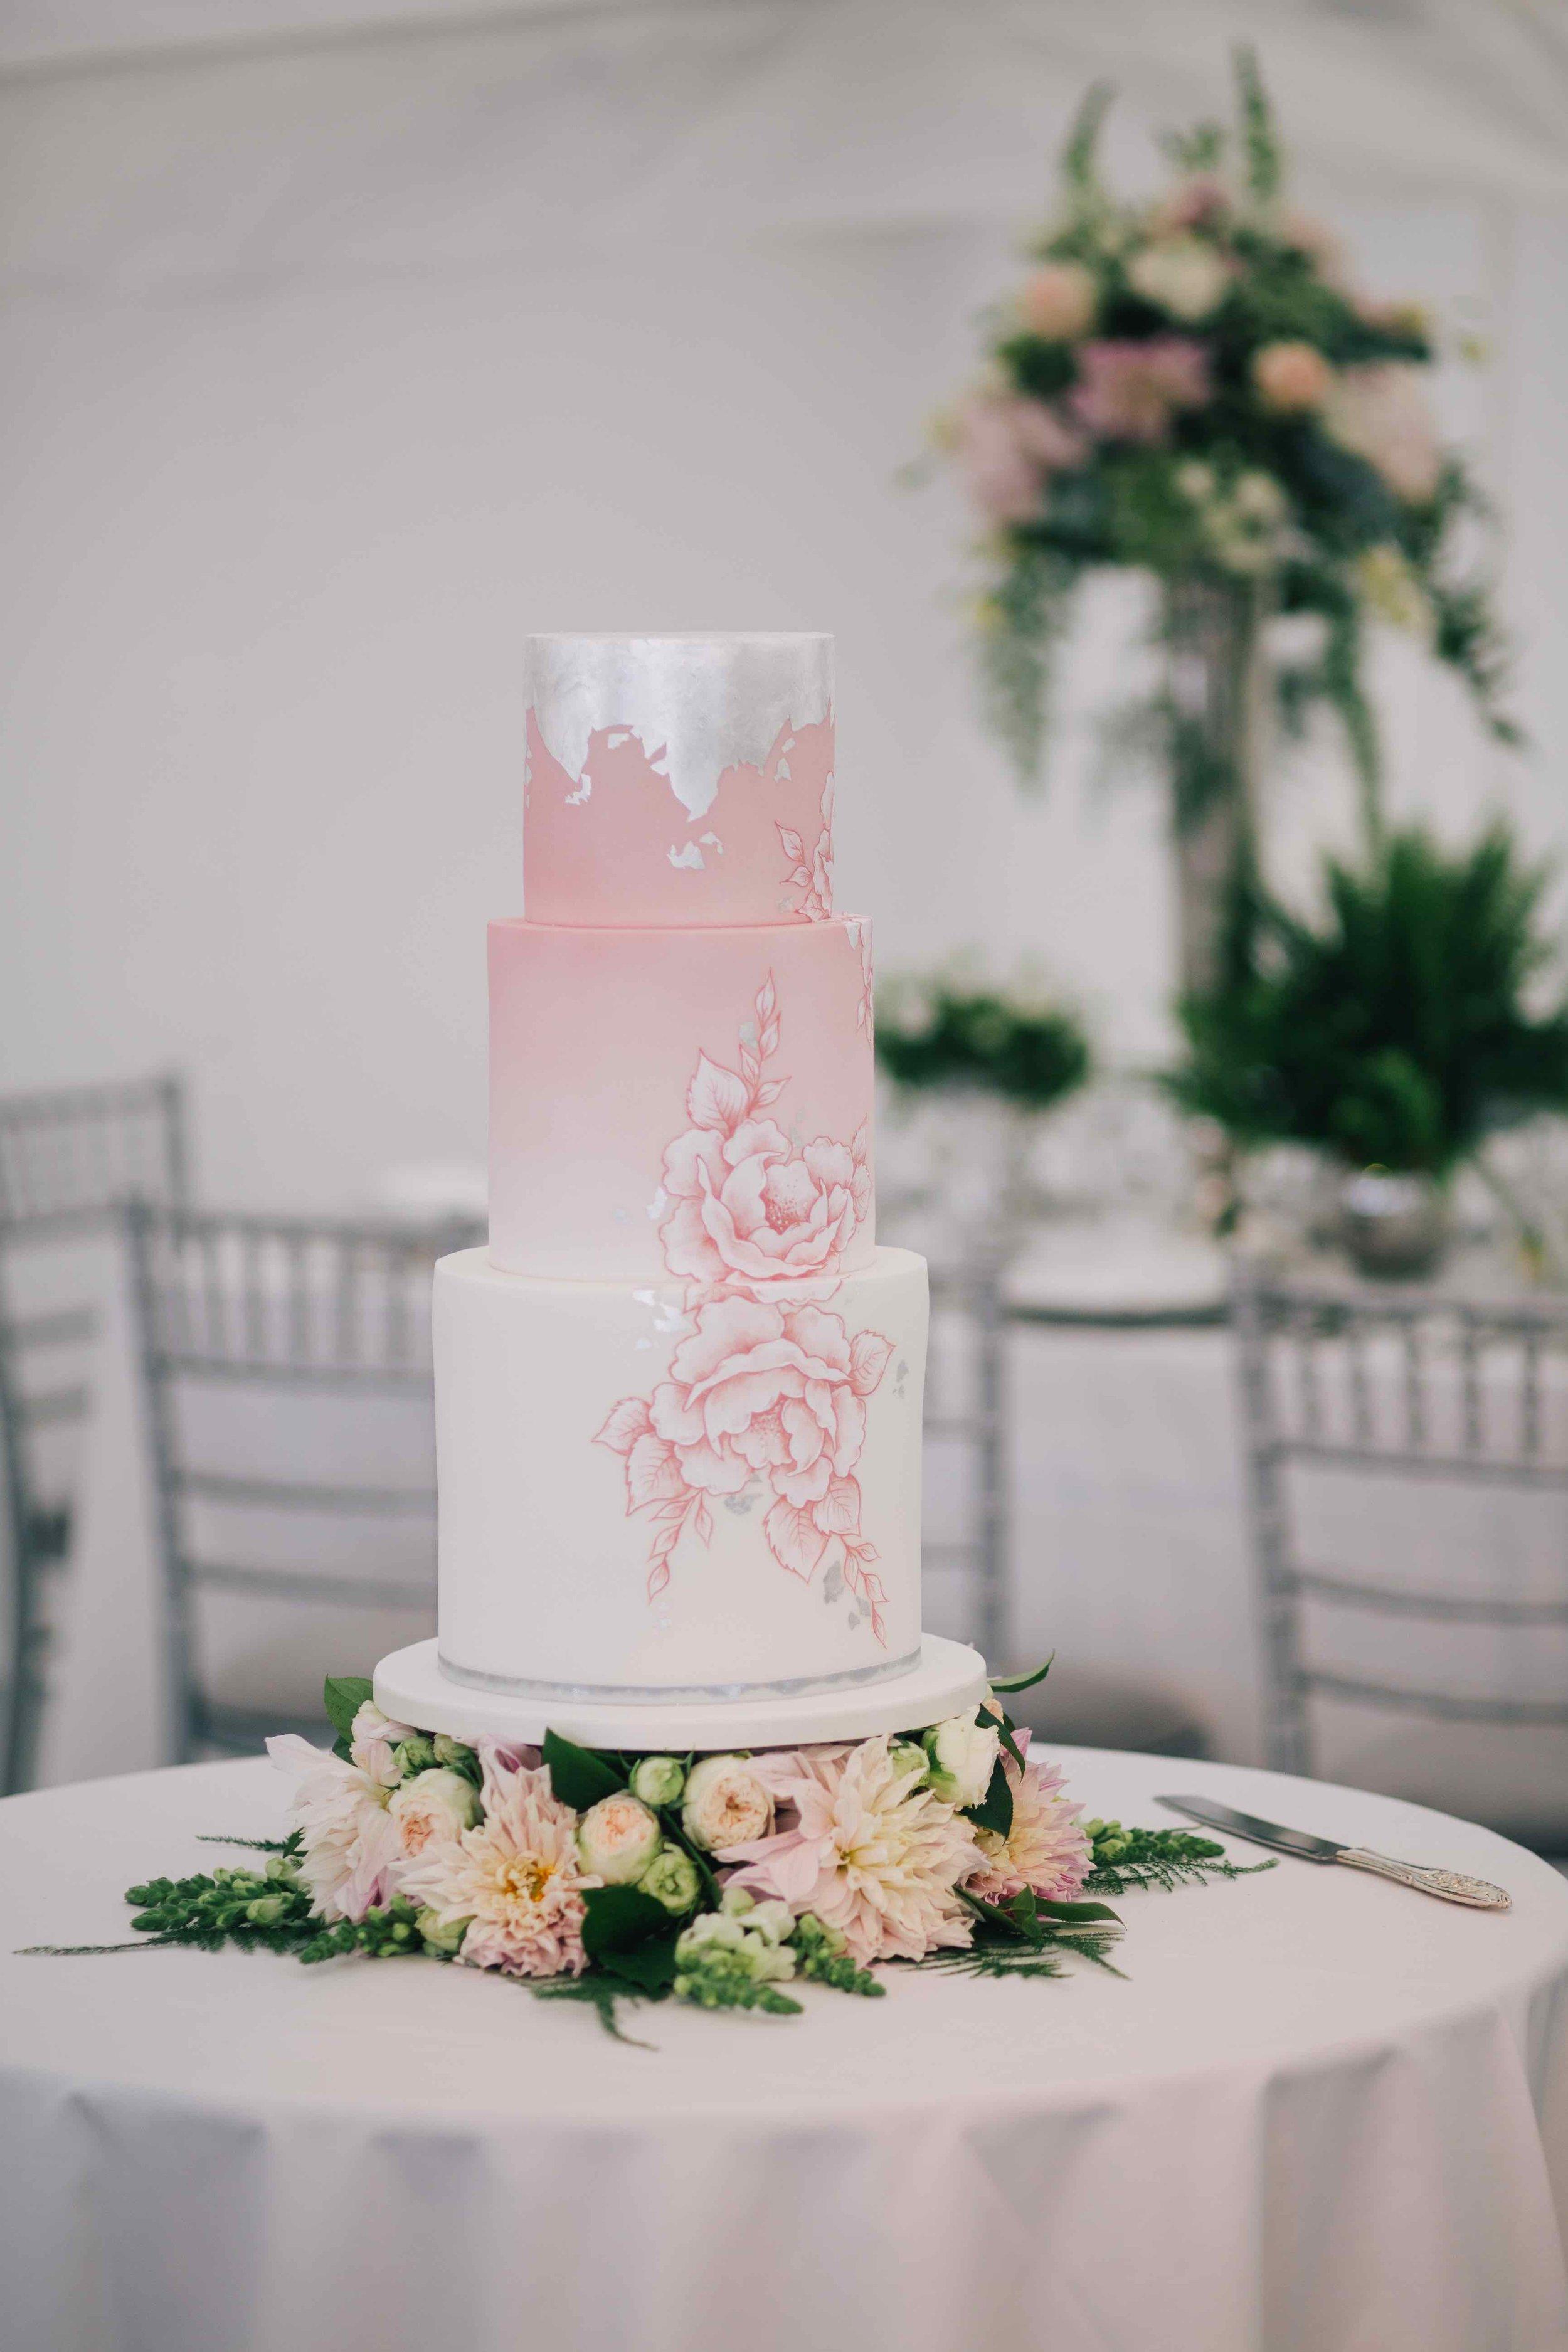 Littleton-Rose-Botanical-Wedding-Cornwall-Wedding-Planners-Wedding-Cake.jpg